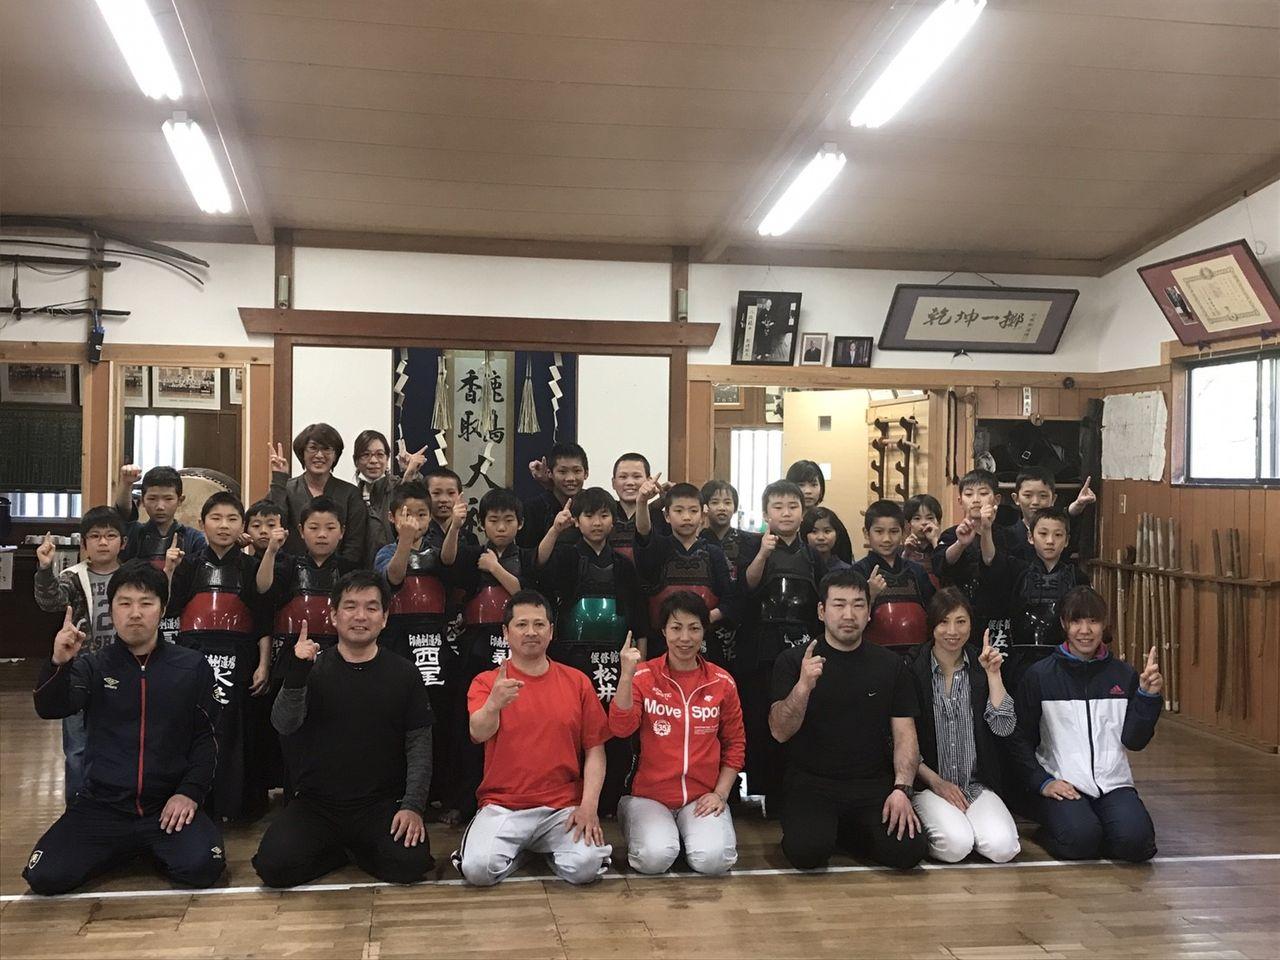 剣道 場 印南